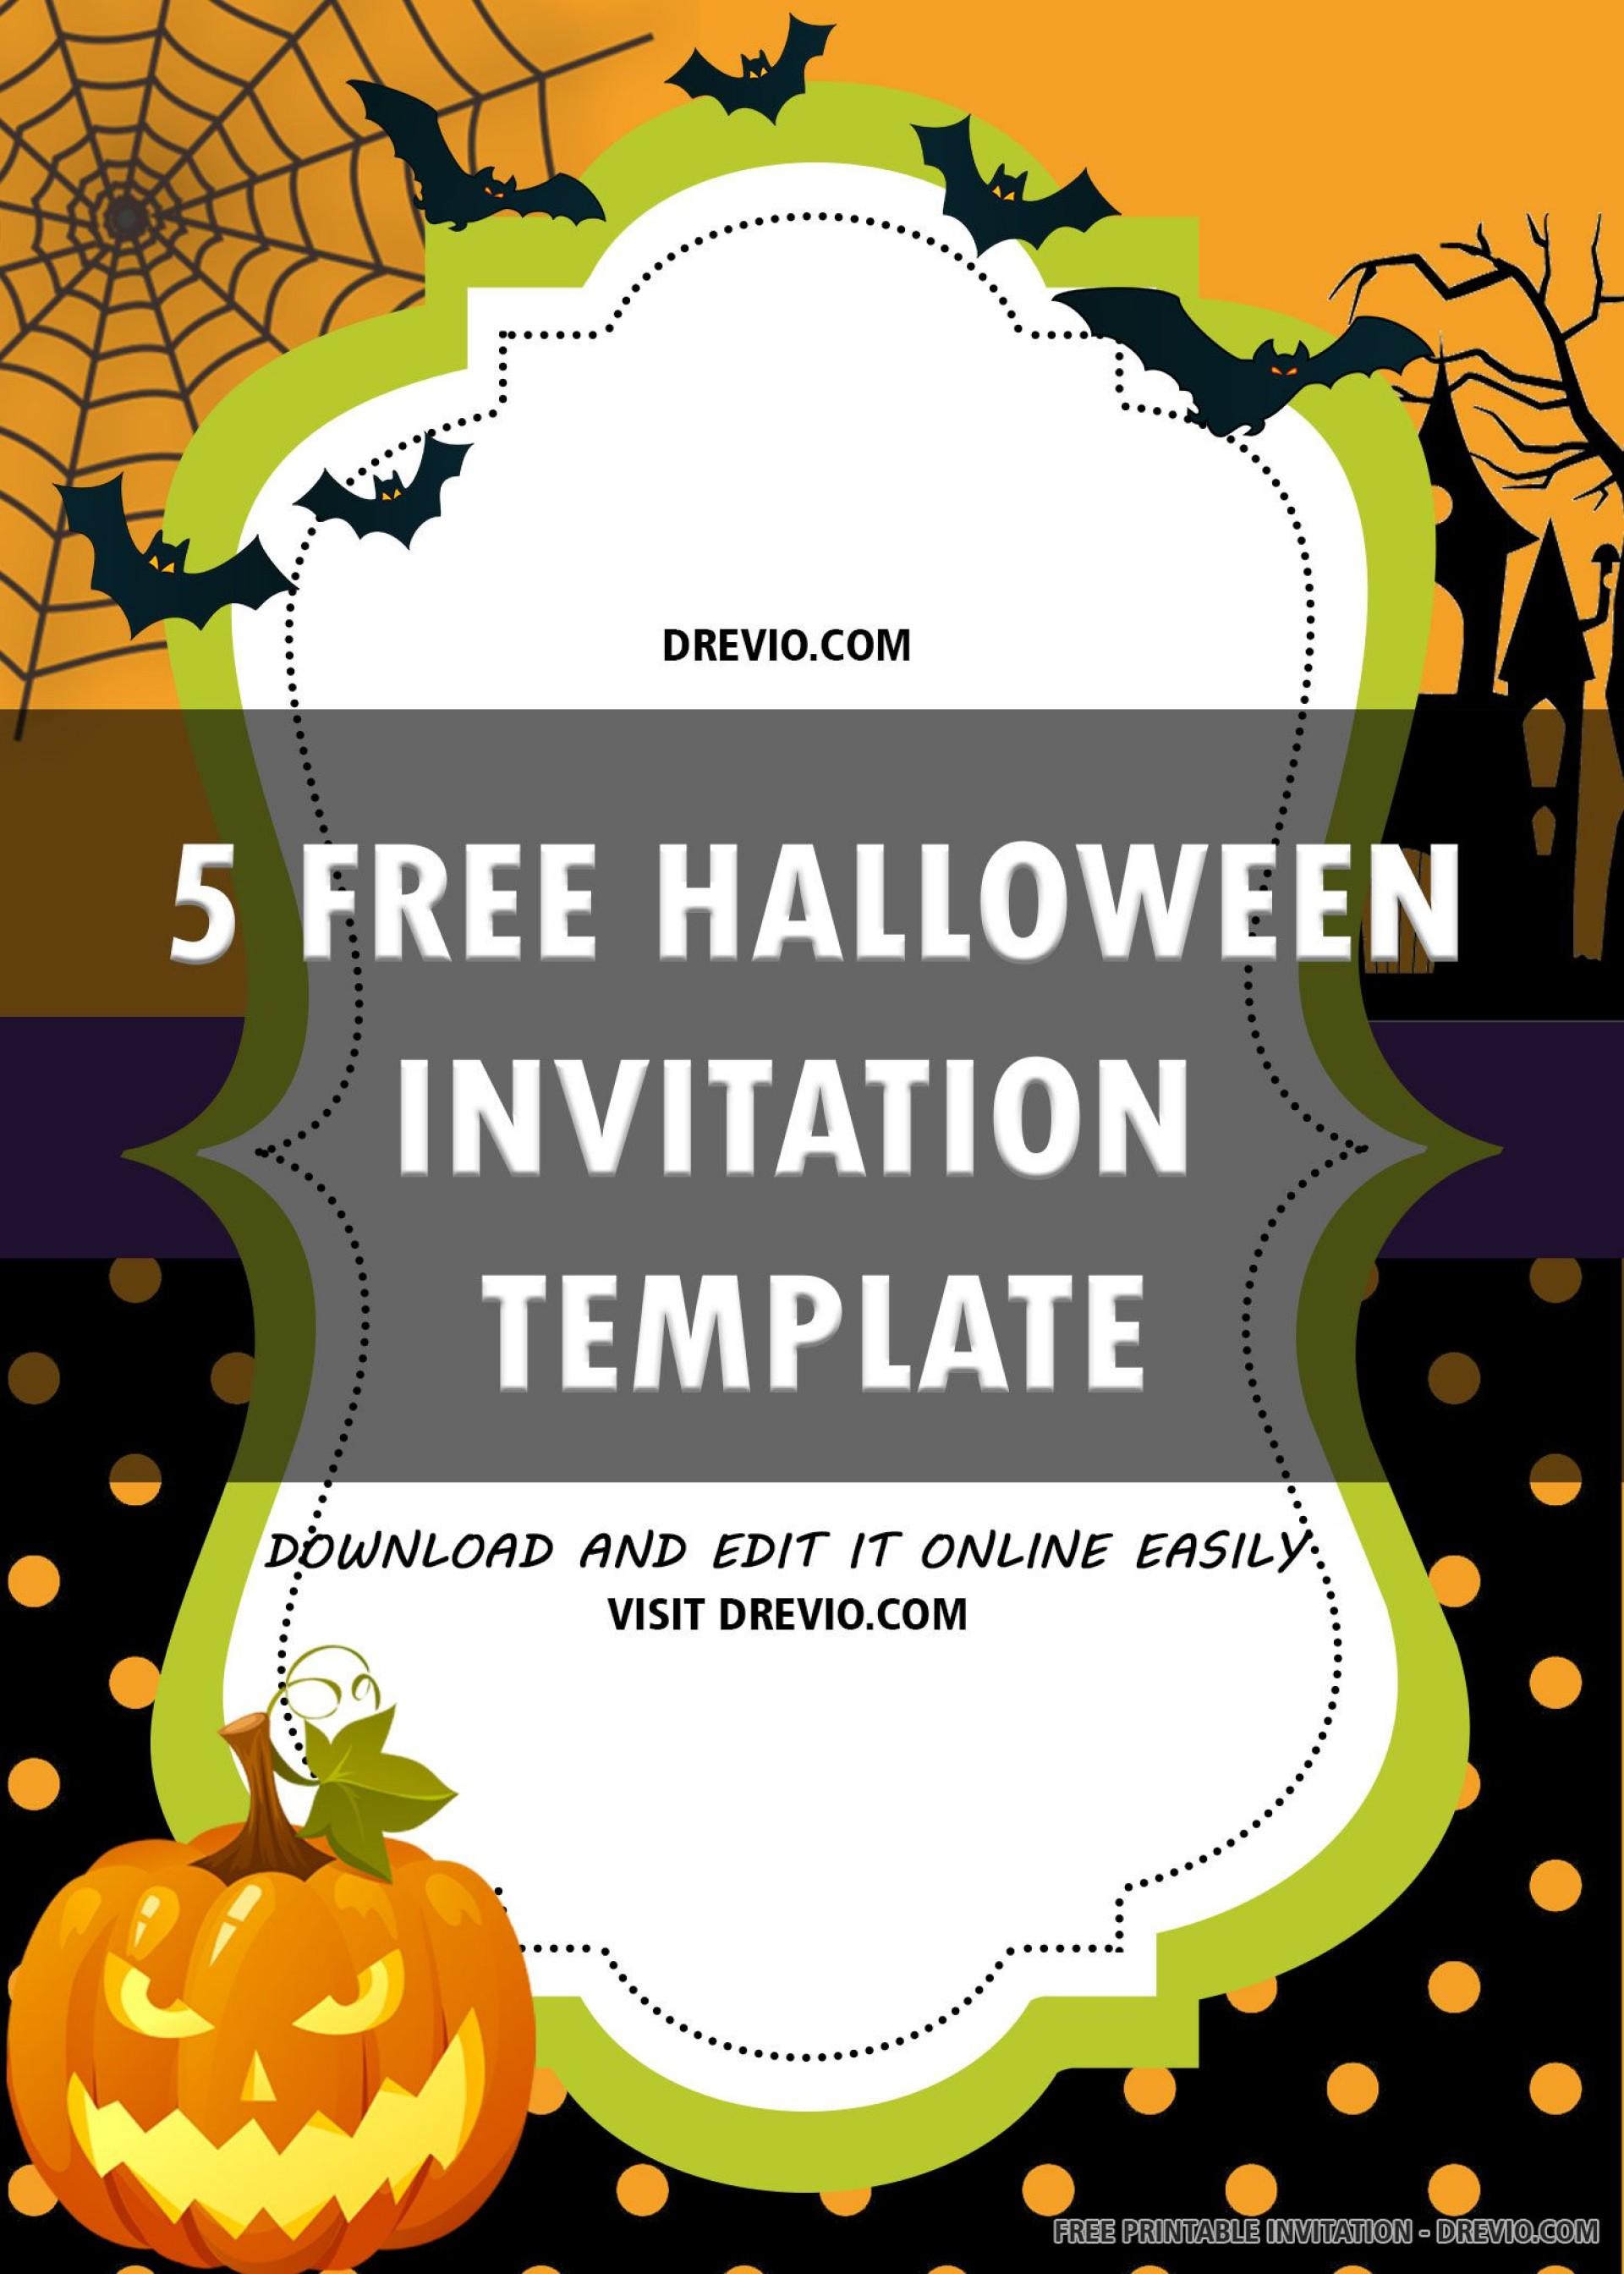 008 Rare Free Halloween Invitation Template Example  Templates Microsoft Word Wedding Printable Party1920